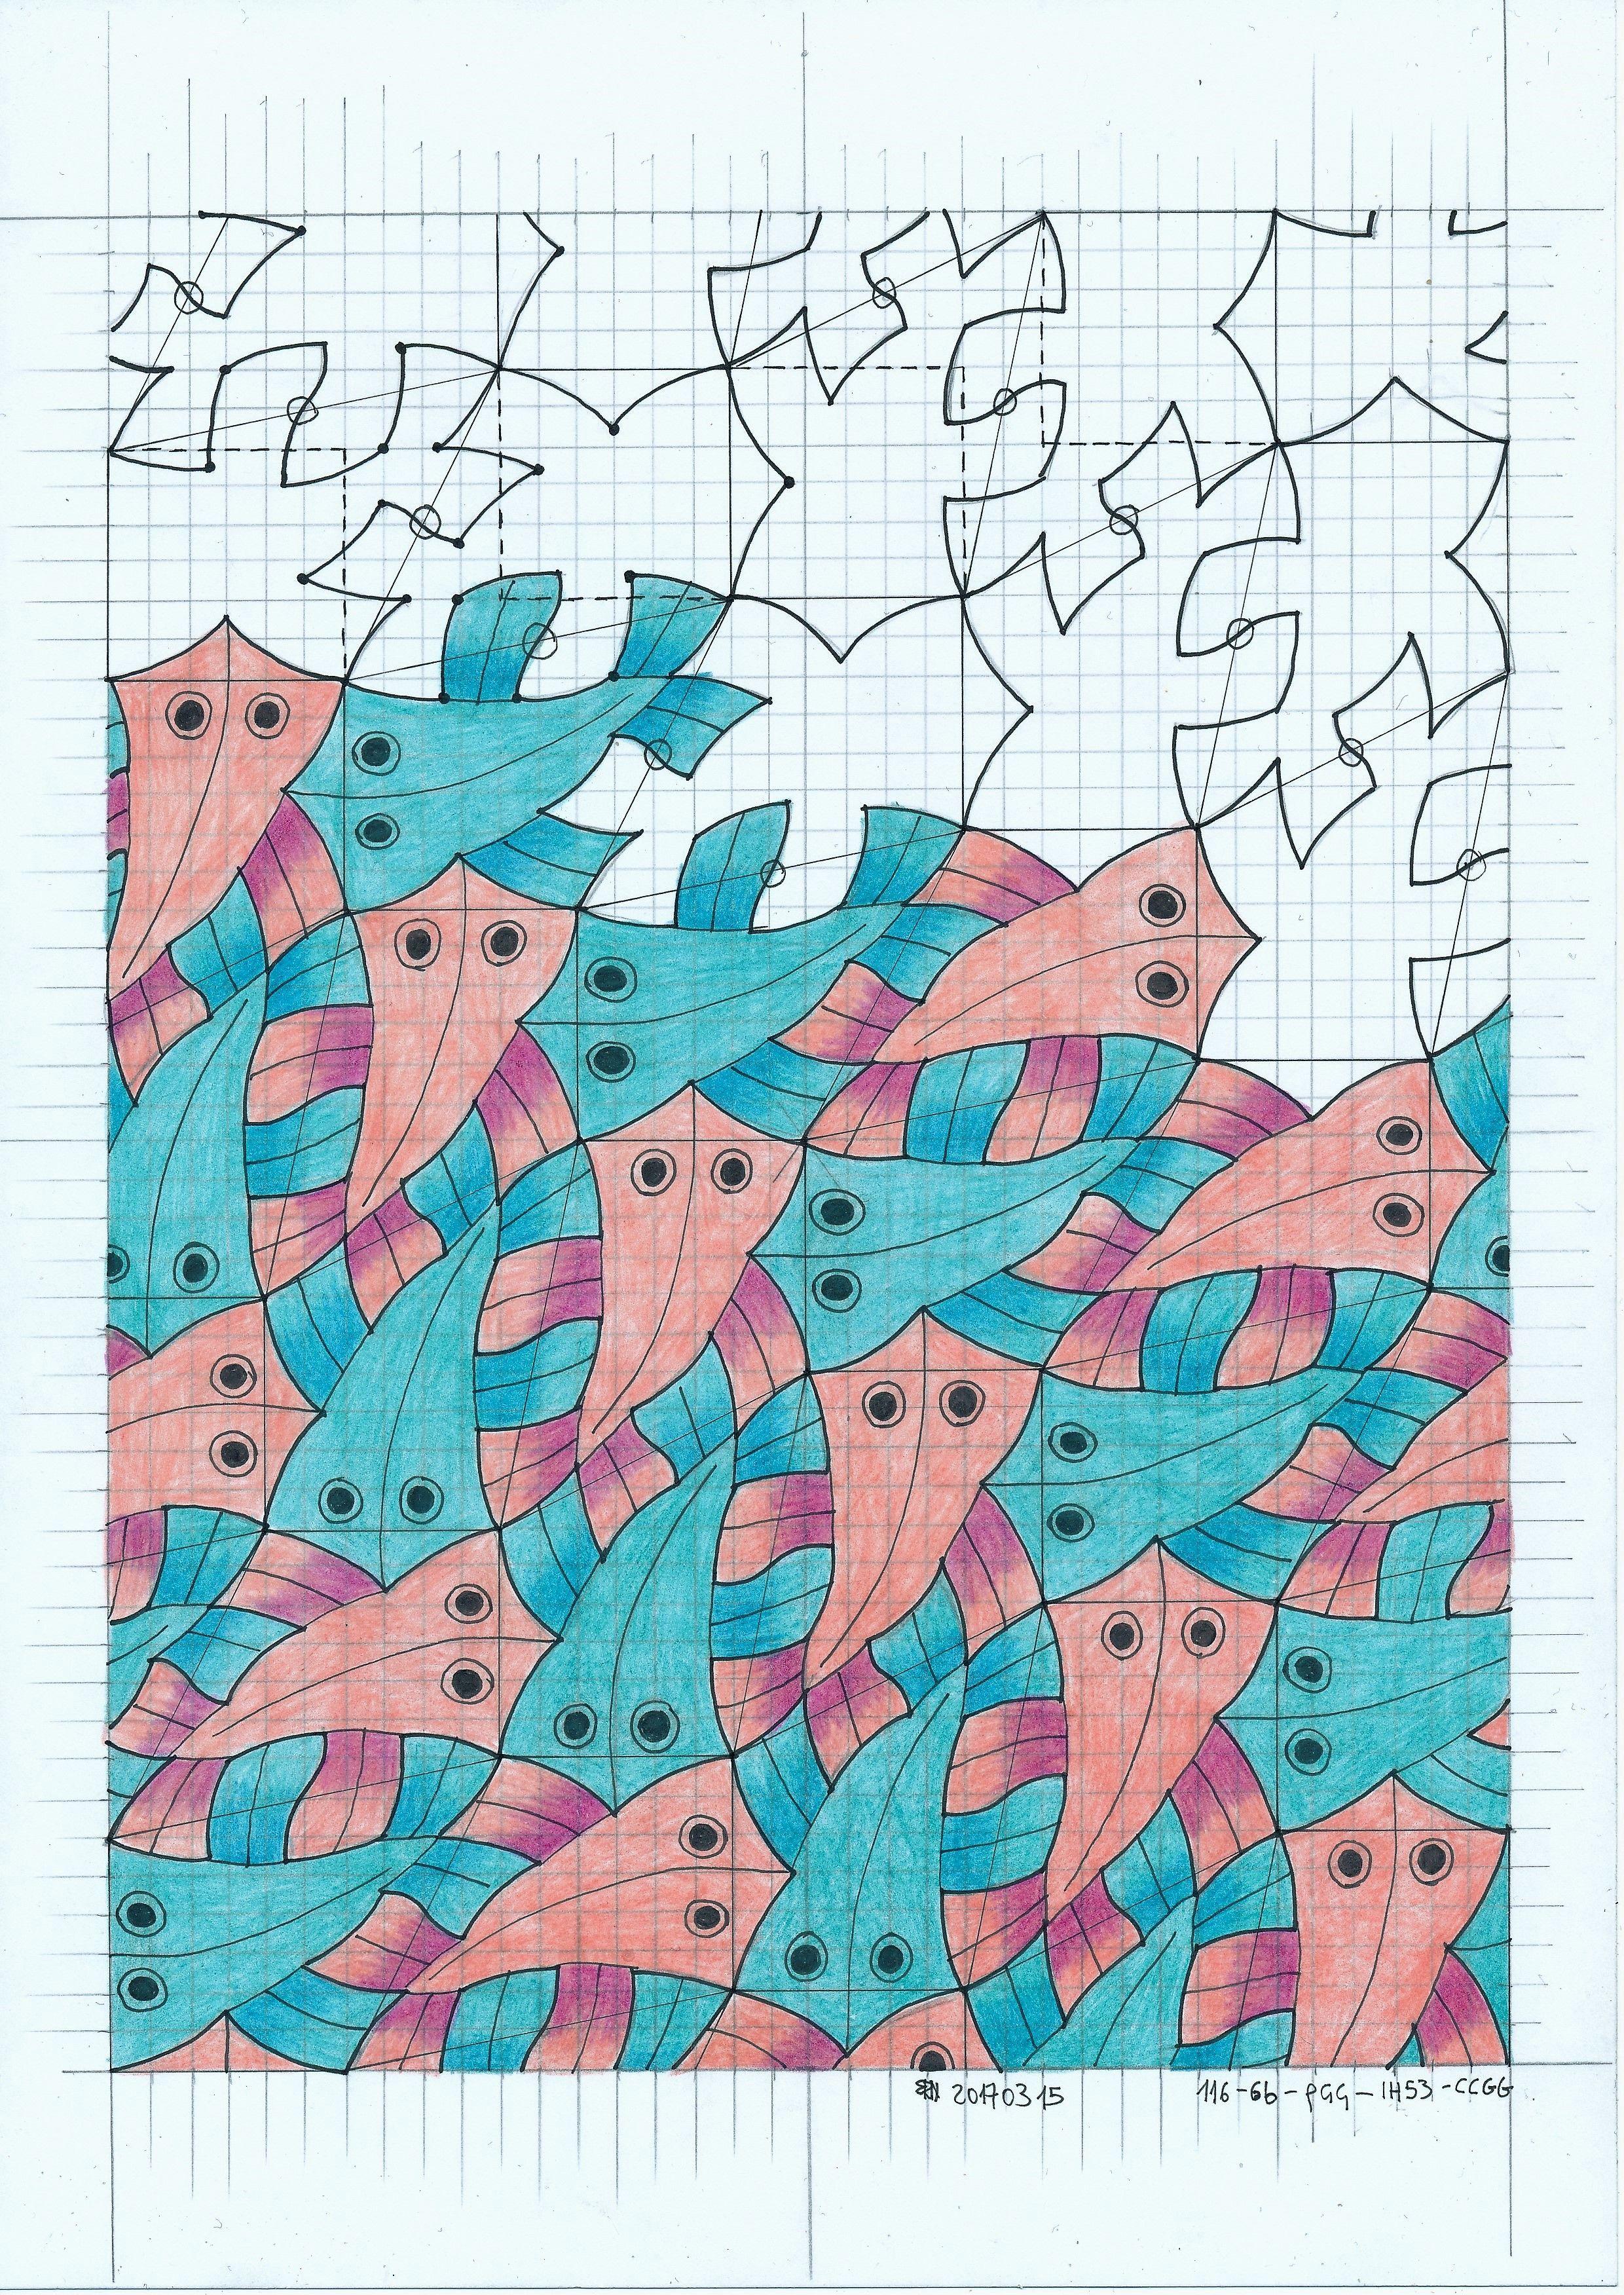 Mc Escher 116 Tessellation Tiling Wallpaper Handmade Infinity Escher Symmetry Geometry Structure Mathart Regolo54 Dibujo Geometrico Artistas Dibujos